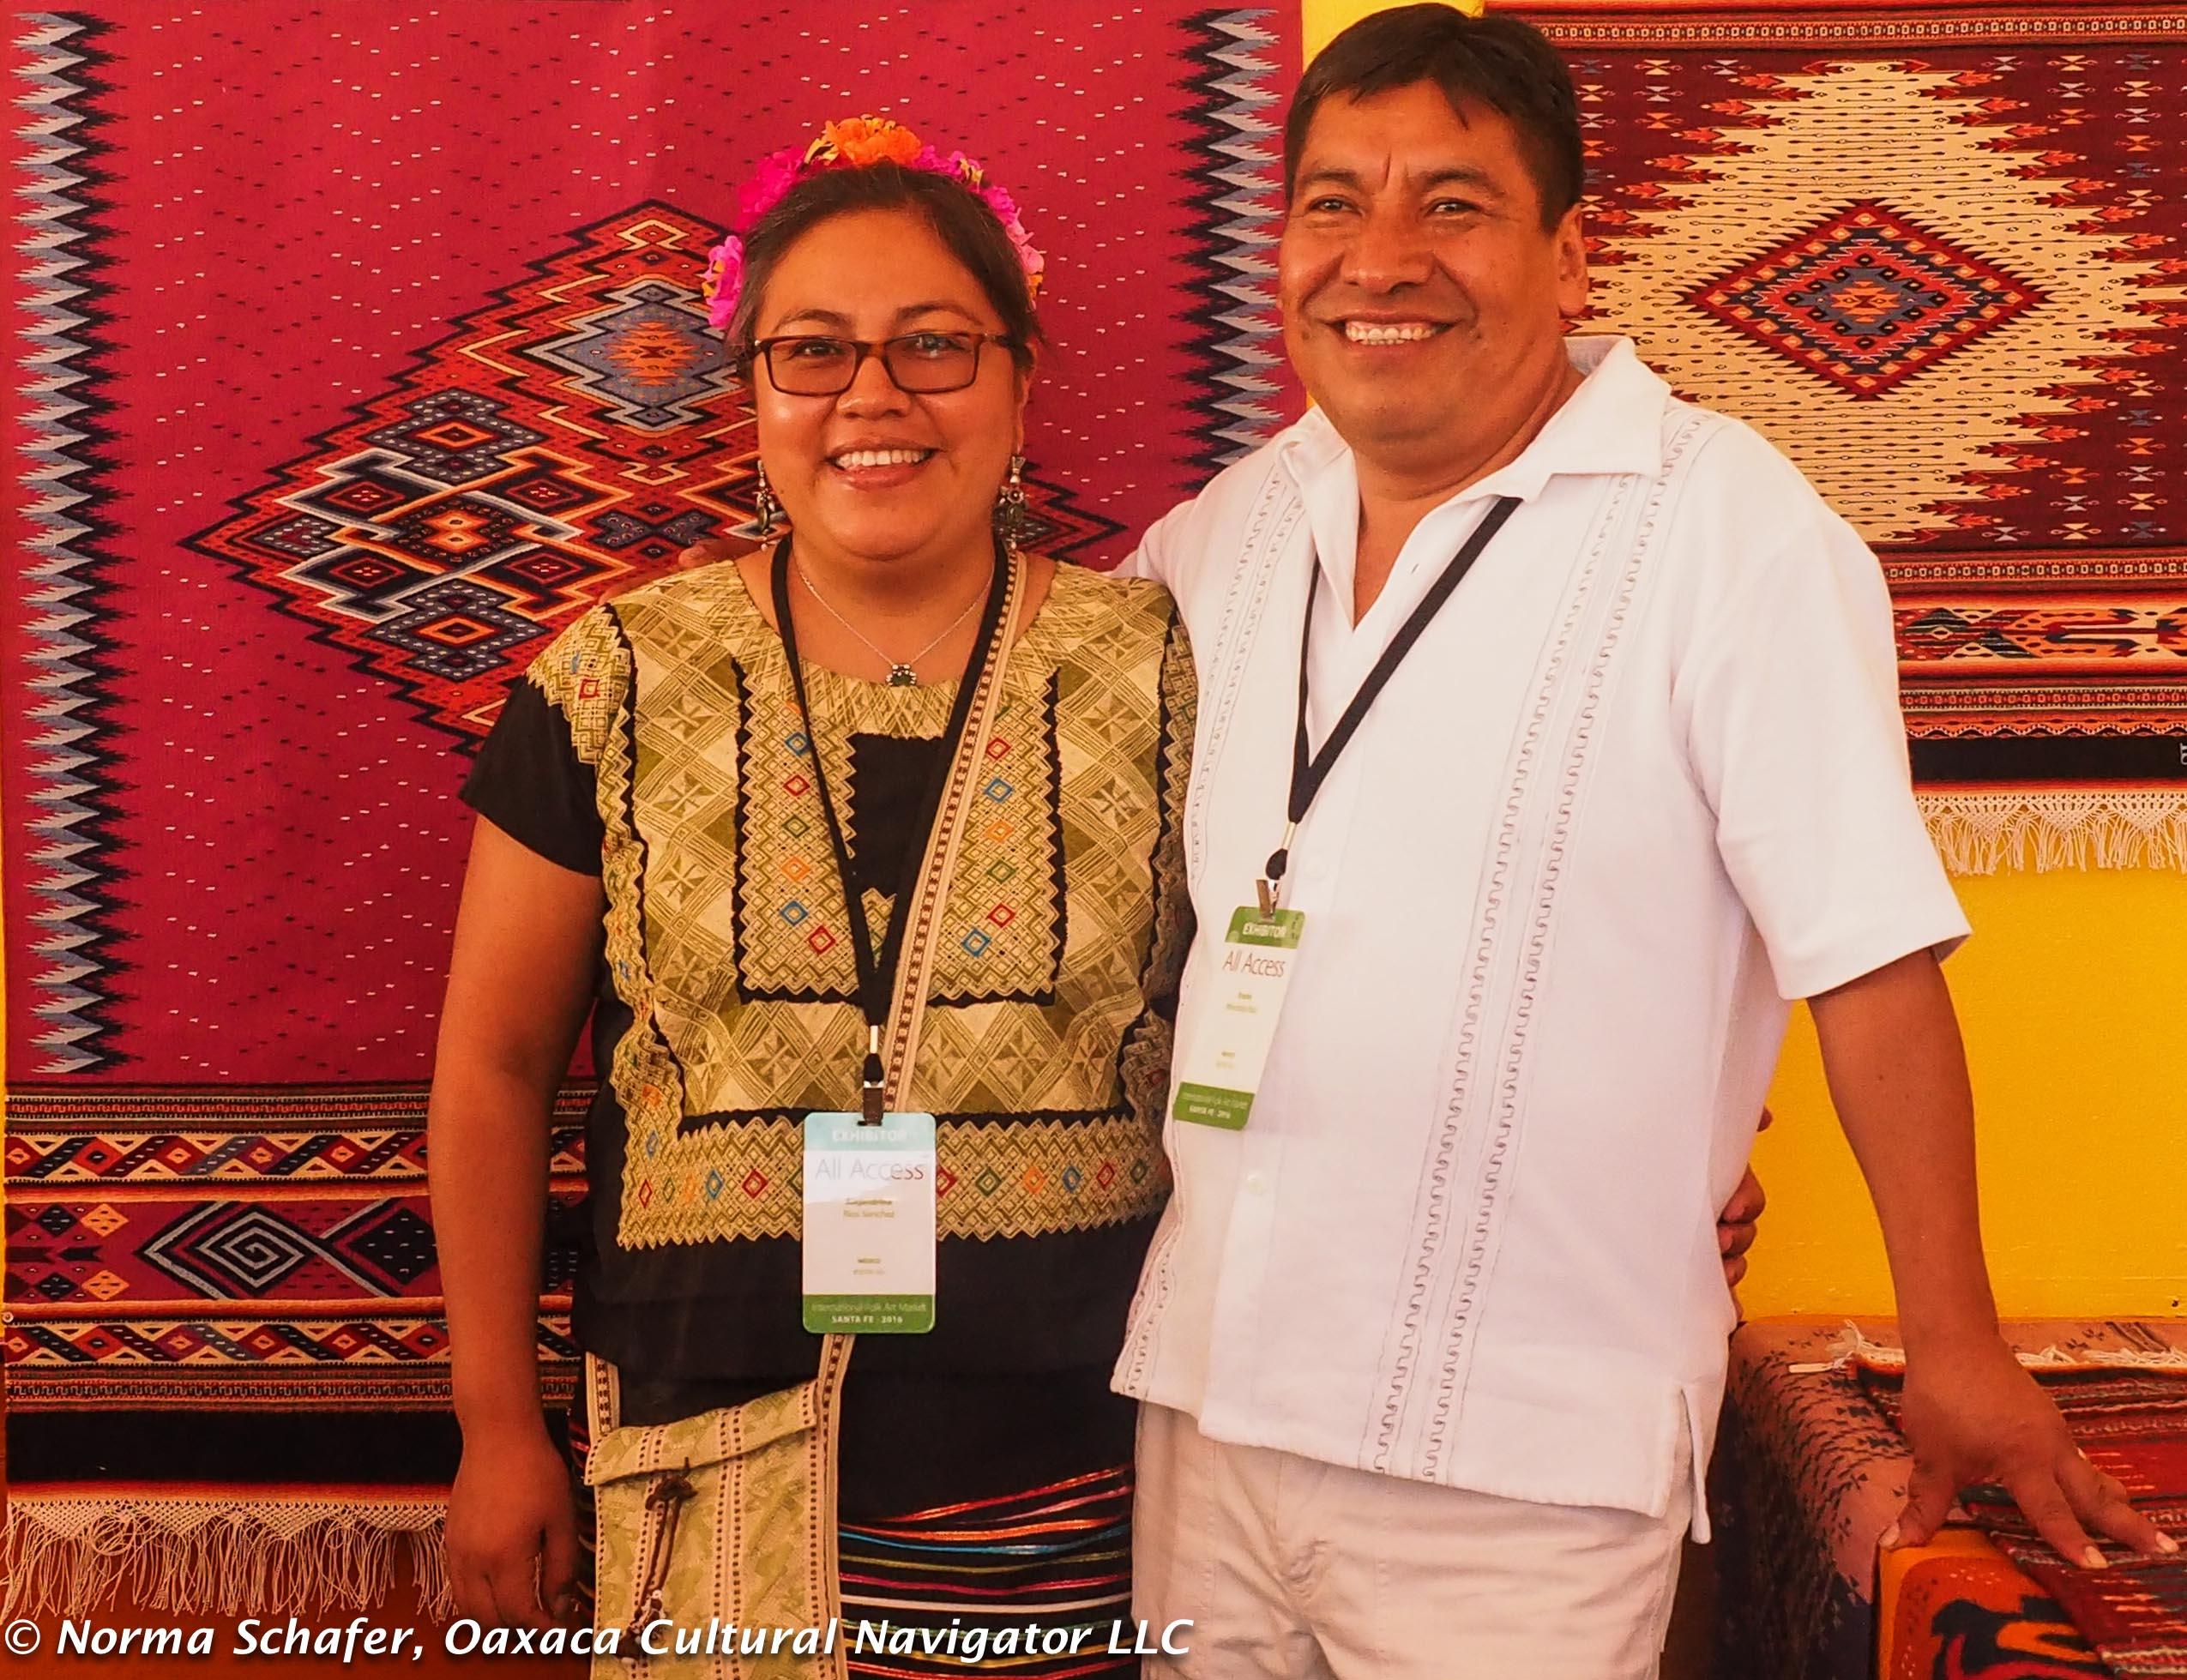 Oaxaca Santa Fe Connection And The International Folk Art